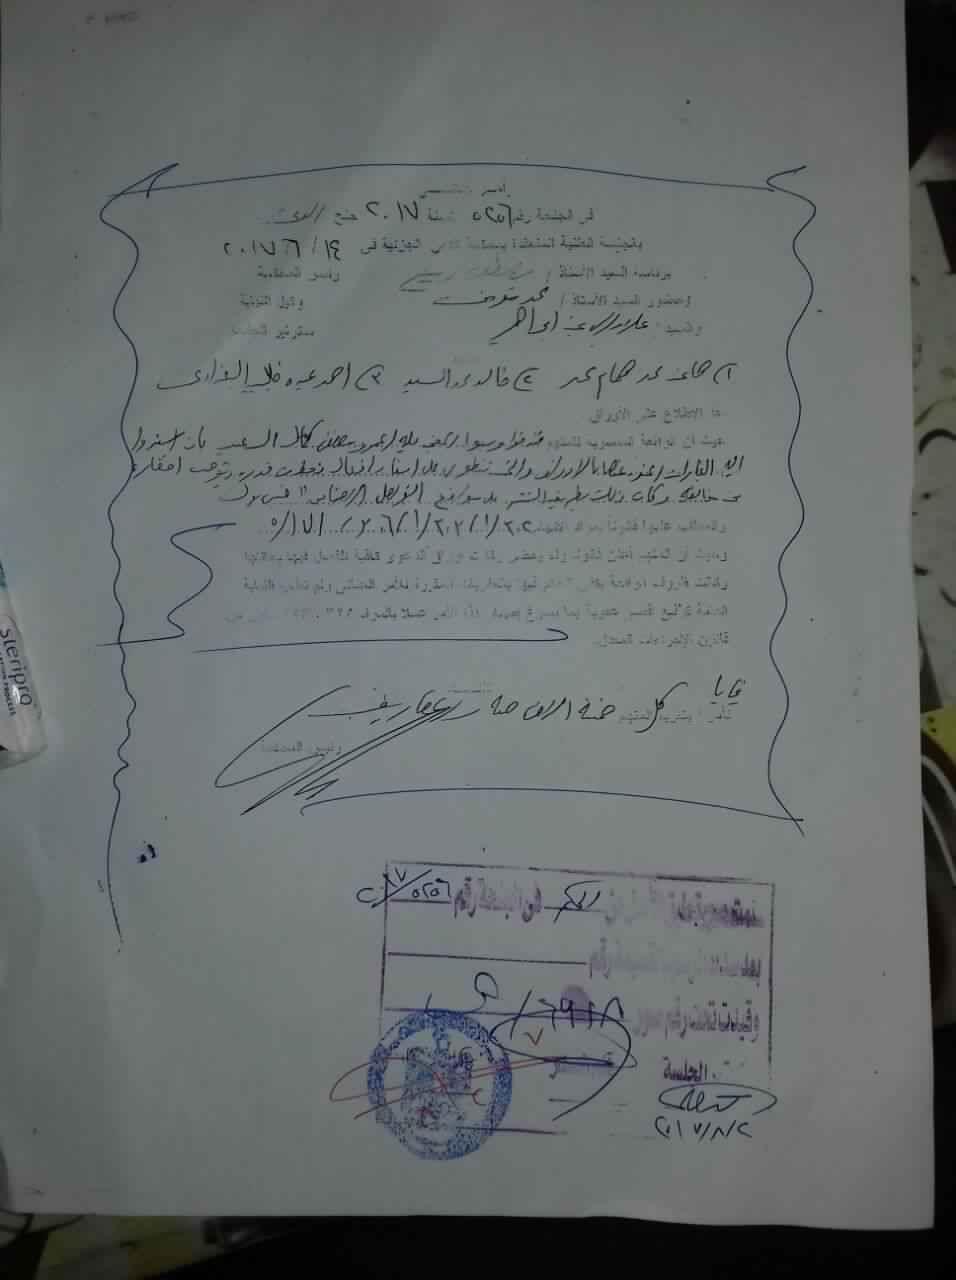 حكم قضائي ضد مروجي الشائعات في نادى الصيد